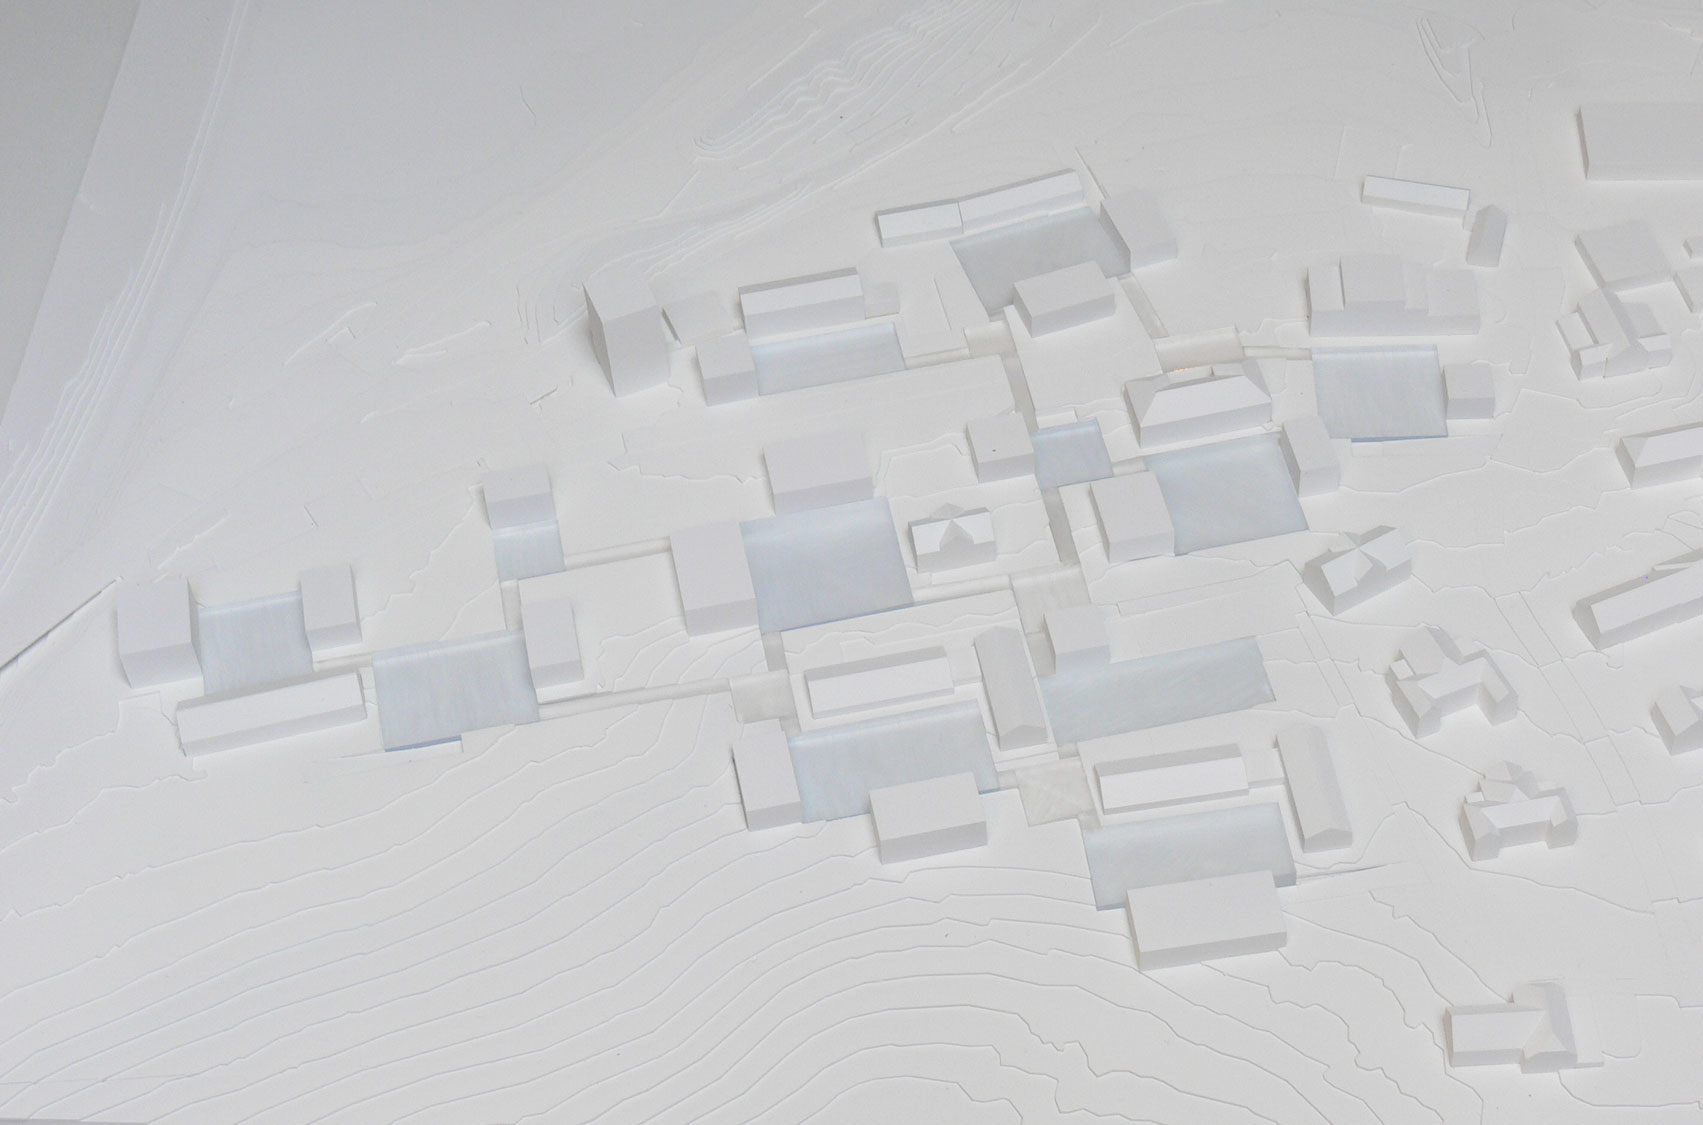 arenas basabe palacios klinik wasserburg. Black Bedroom Furniture Sets. Home Design Ideas